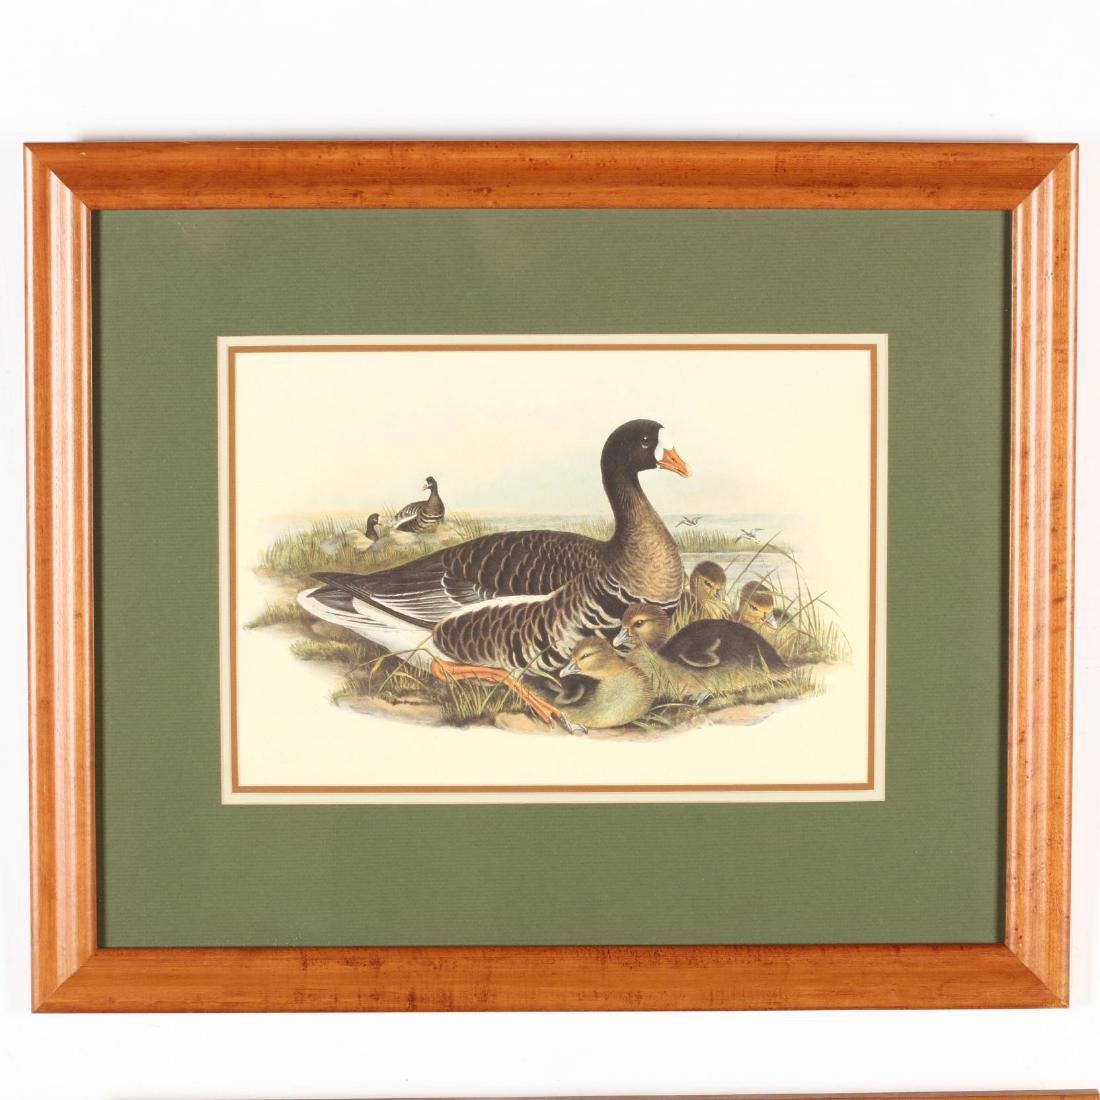 Pair of Framed Ornithological Prints - 2